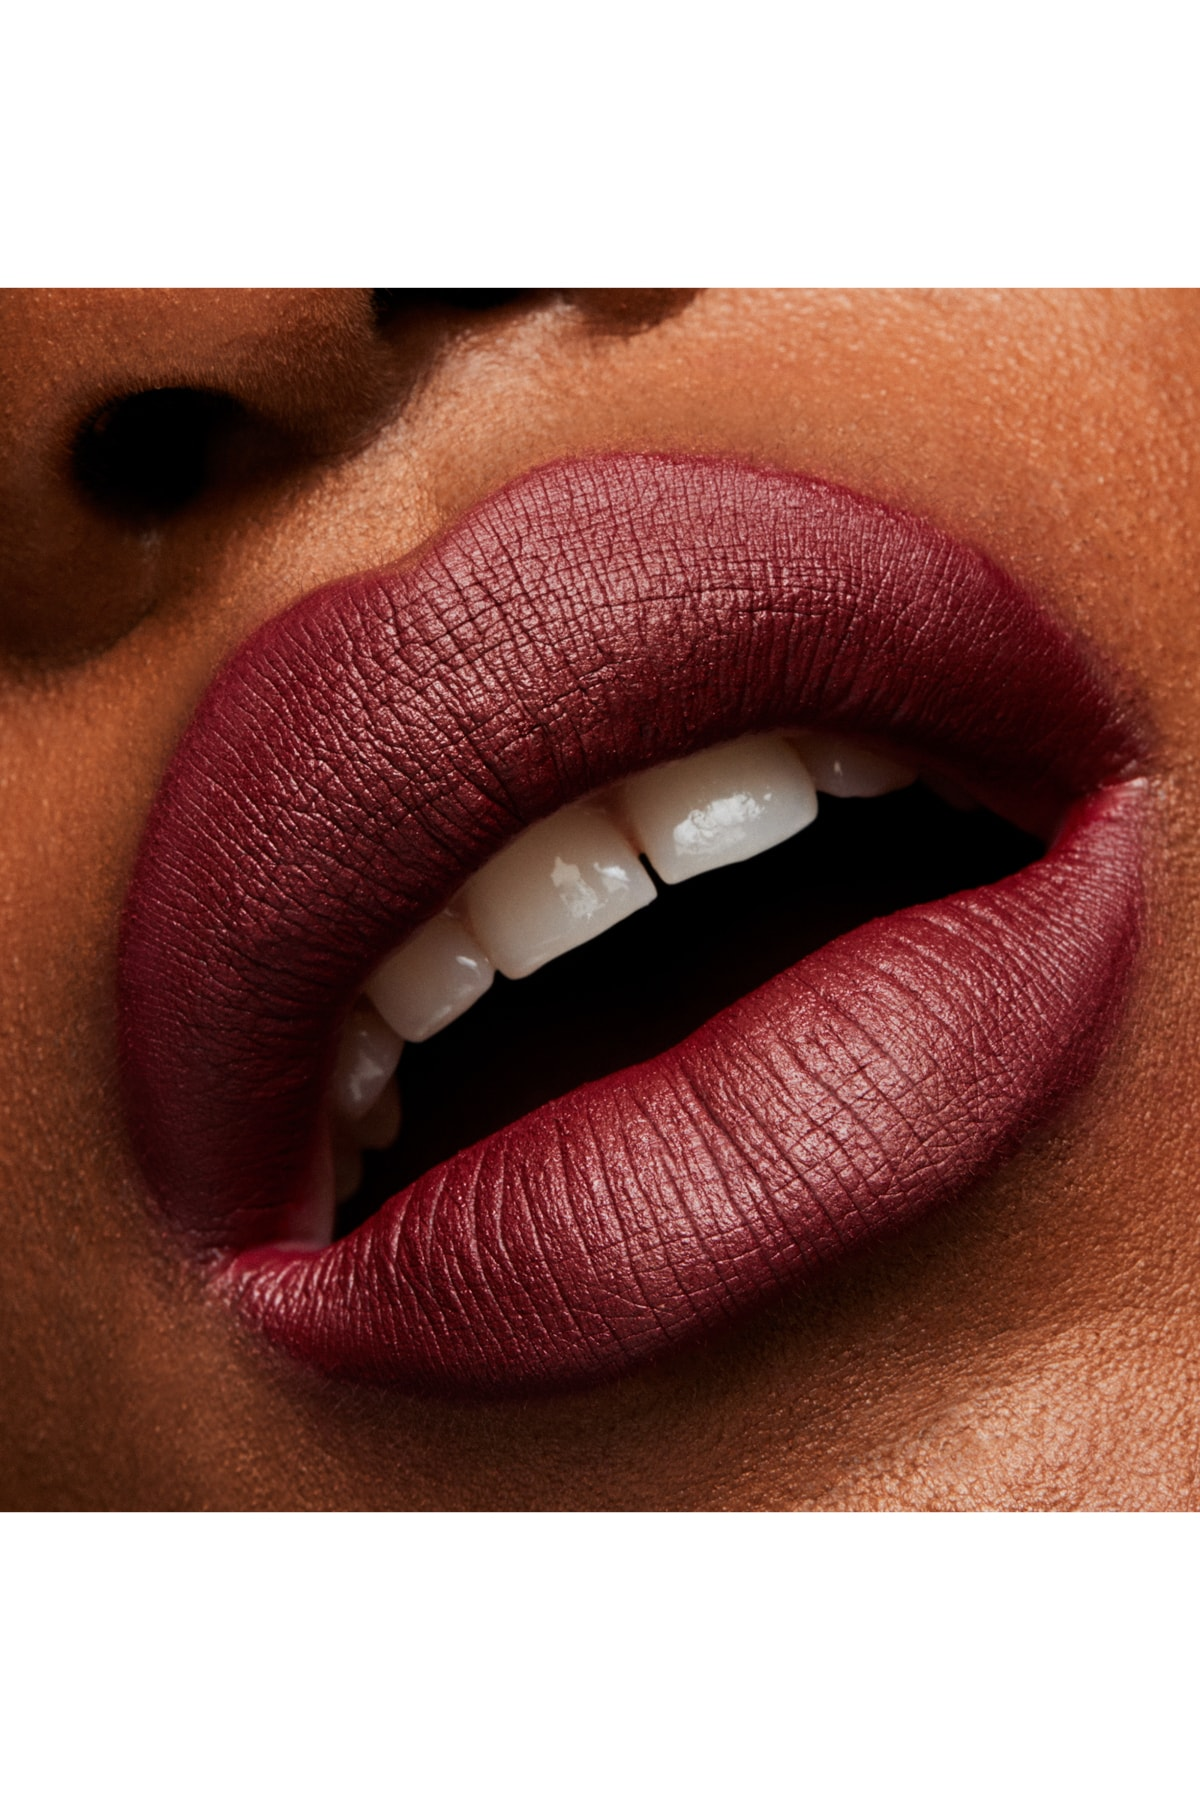 M.A.C Ruj - Lipstick Diva 3 g 773602048670 2